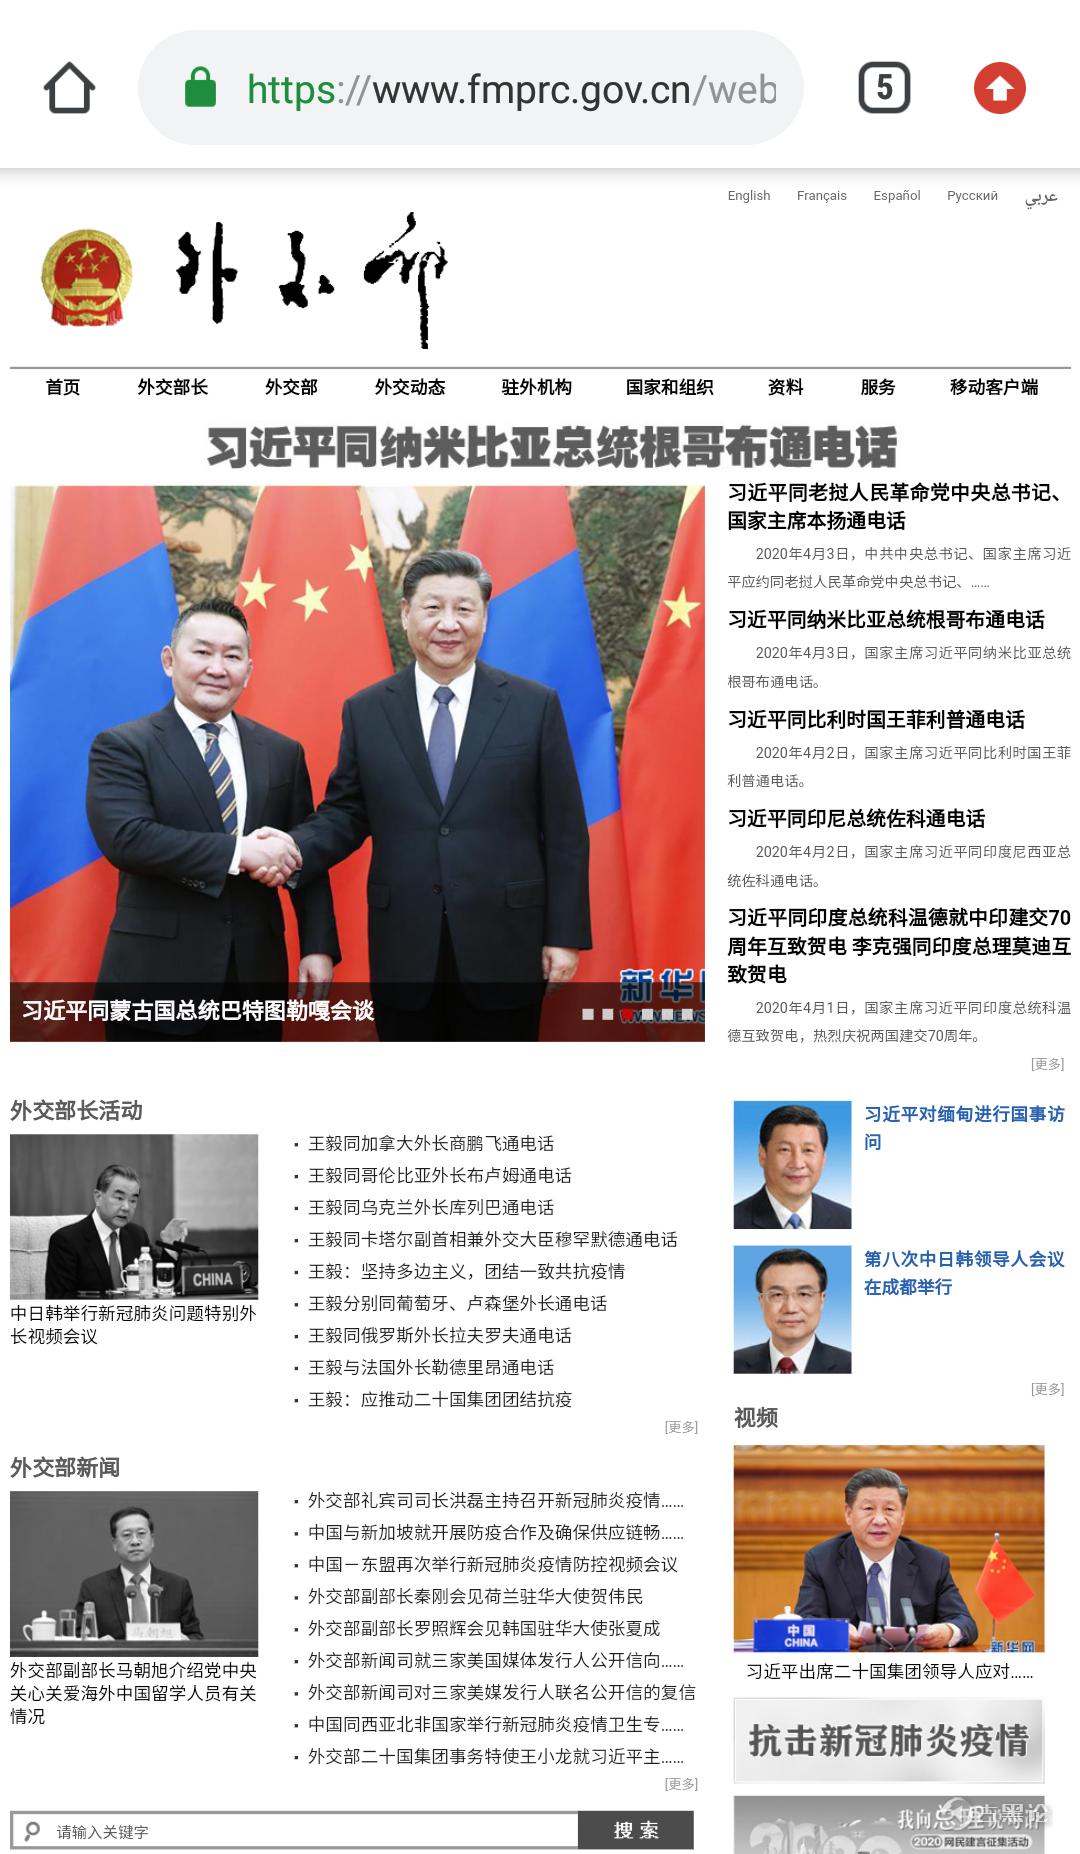 举国哀悼404 Screenshot_2020-04-04-08-10-29.png